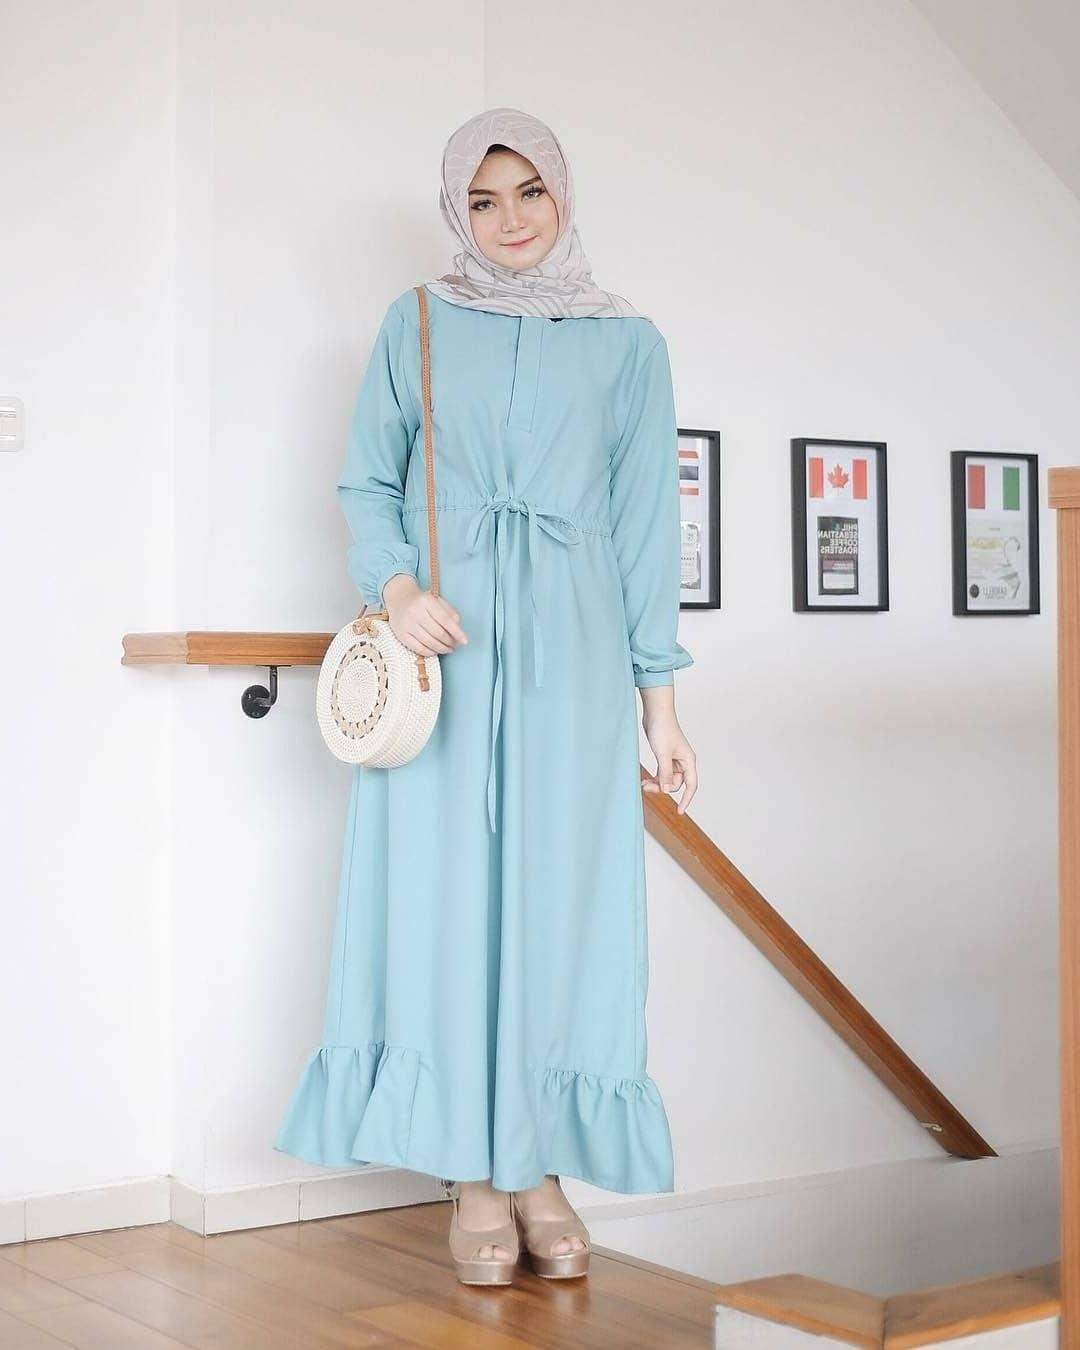 Design Baju Lebaran Anak Perempuan 2018 Budm Tren Busana Muslim Terbaru Untuk Merayakan Hari Raya Yang